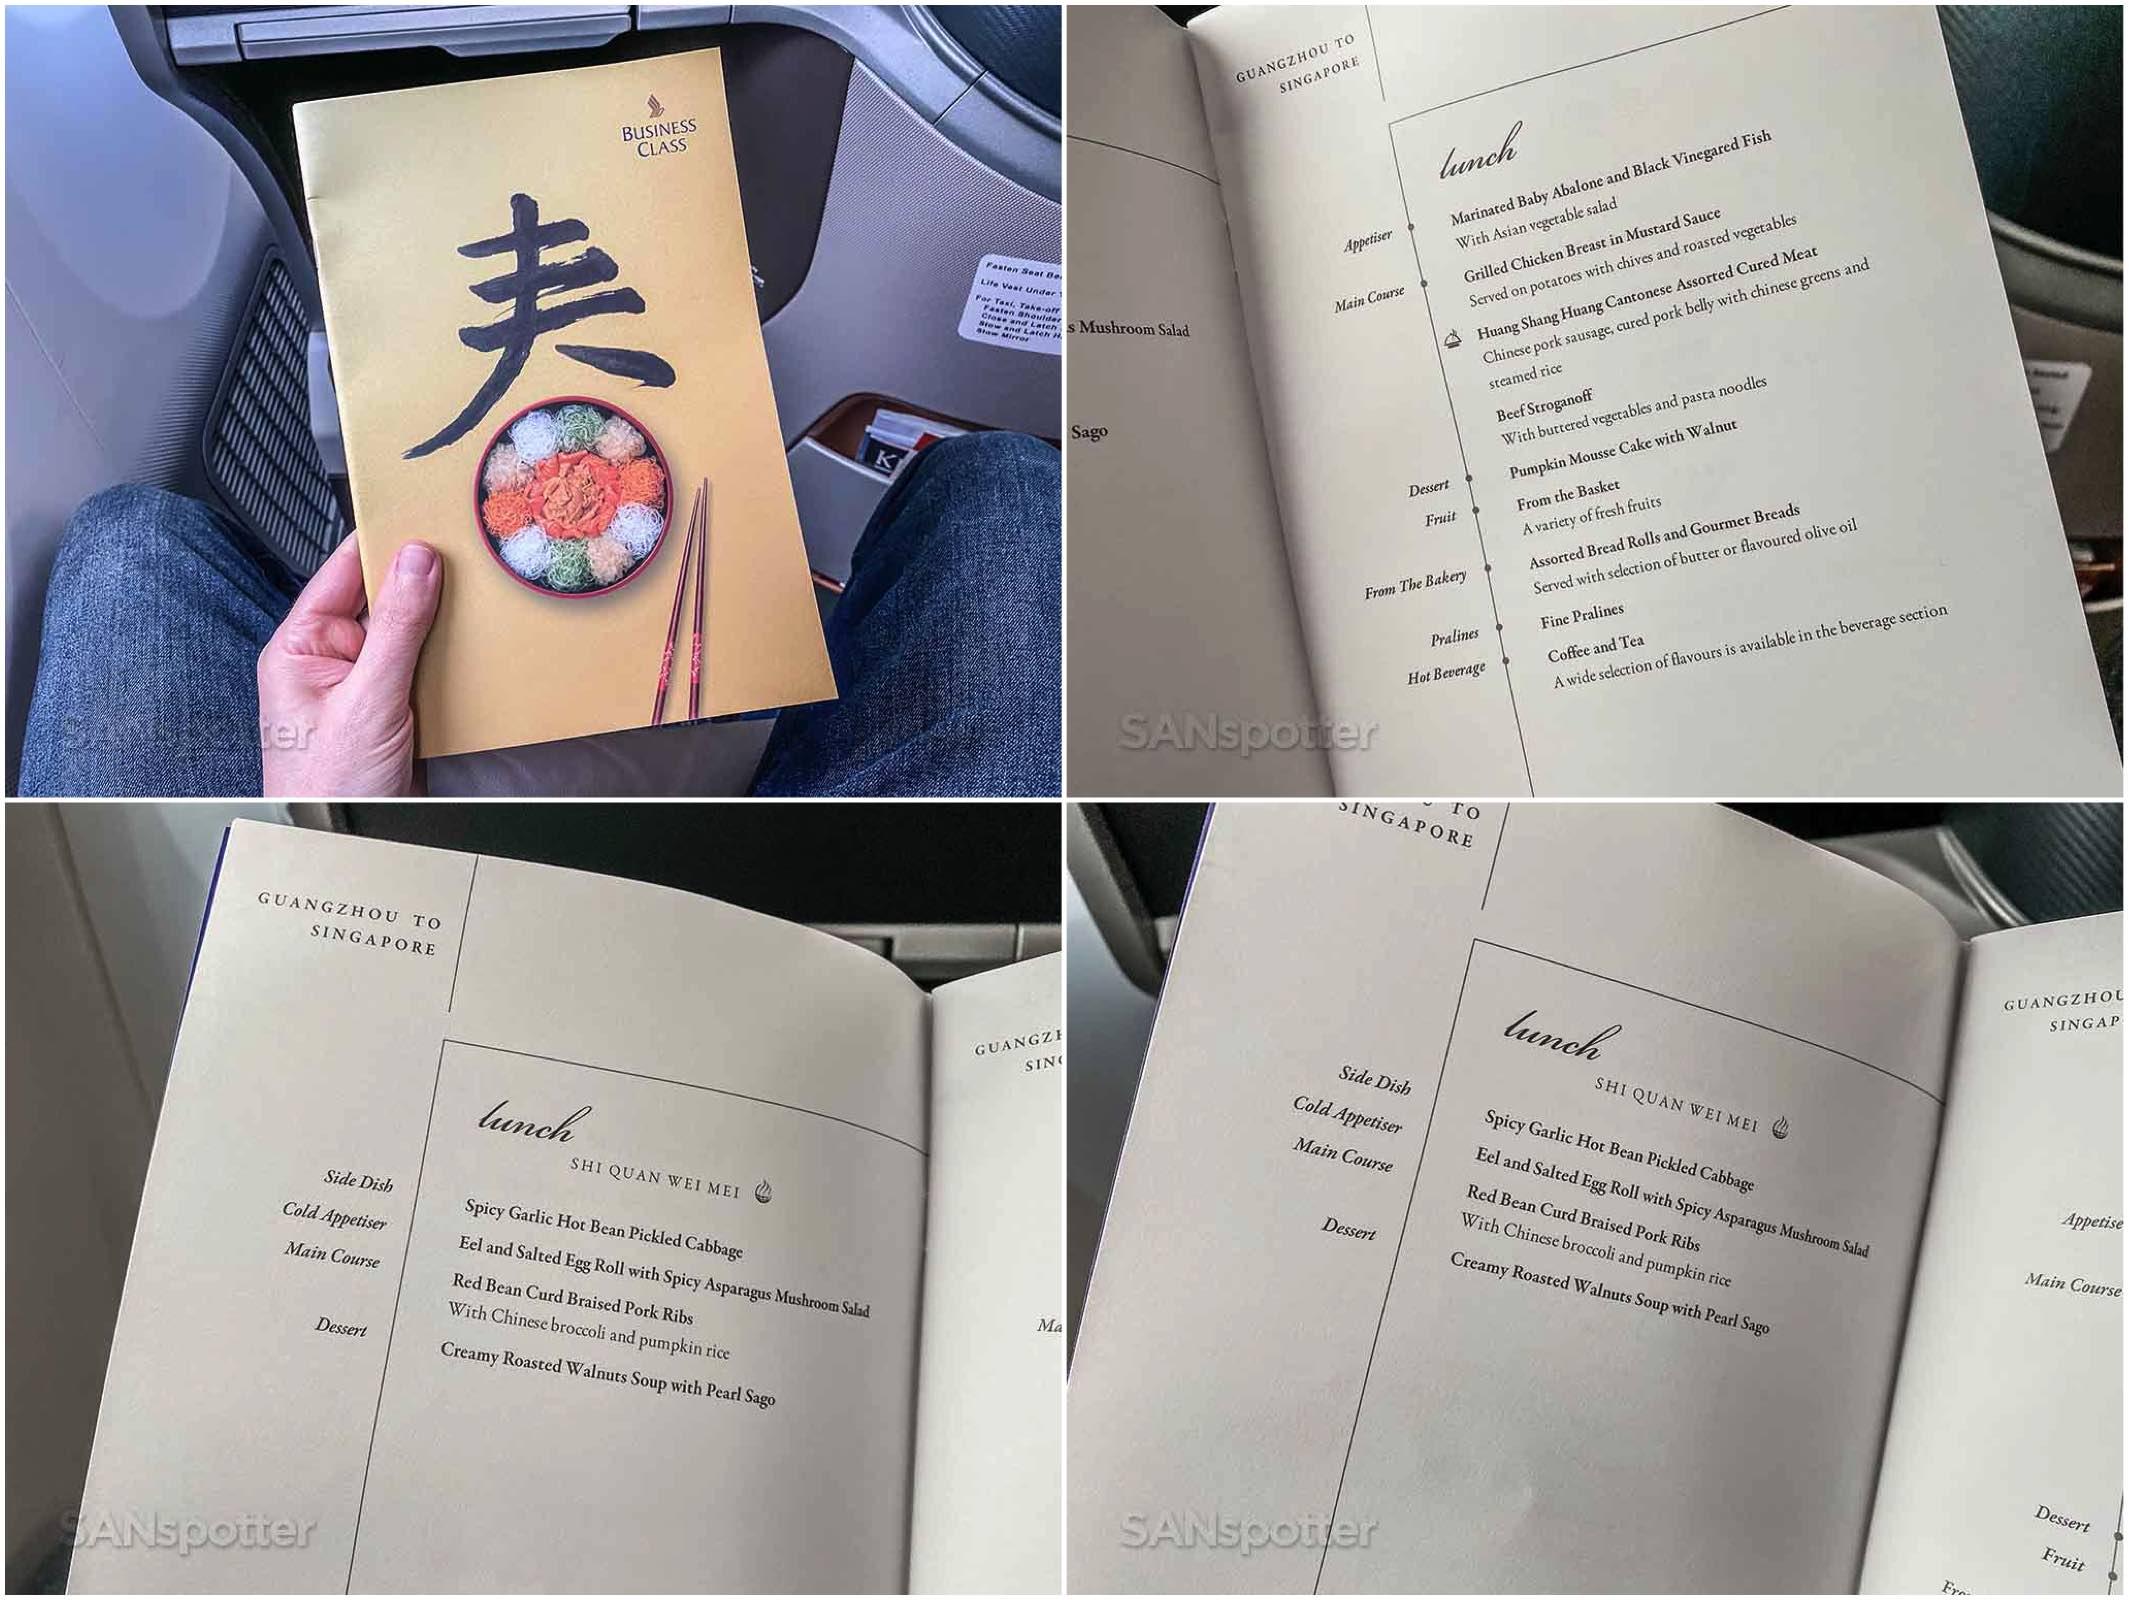 Singapore Airlines regional business class menu